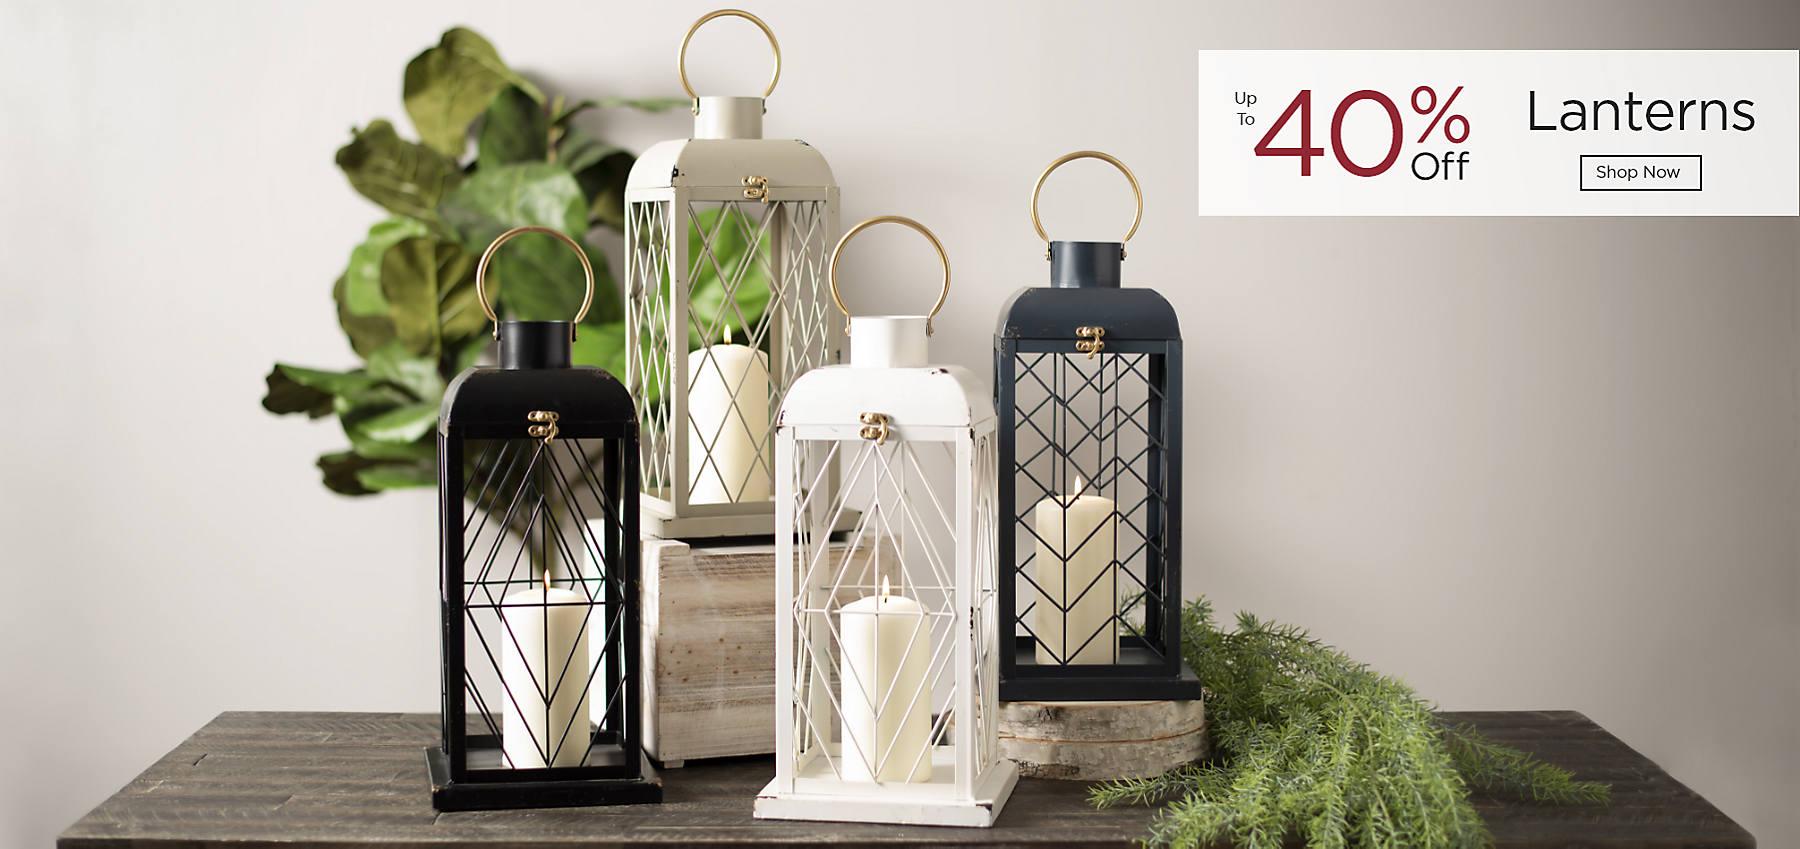 Lanterns Up to 40% Off